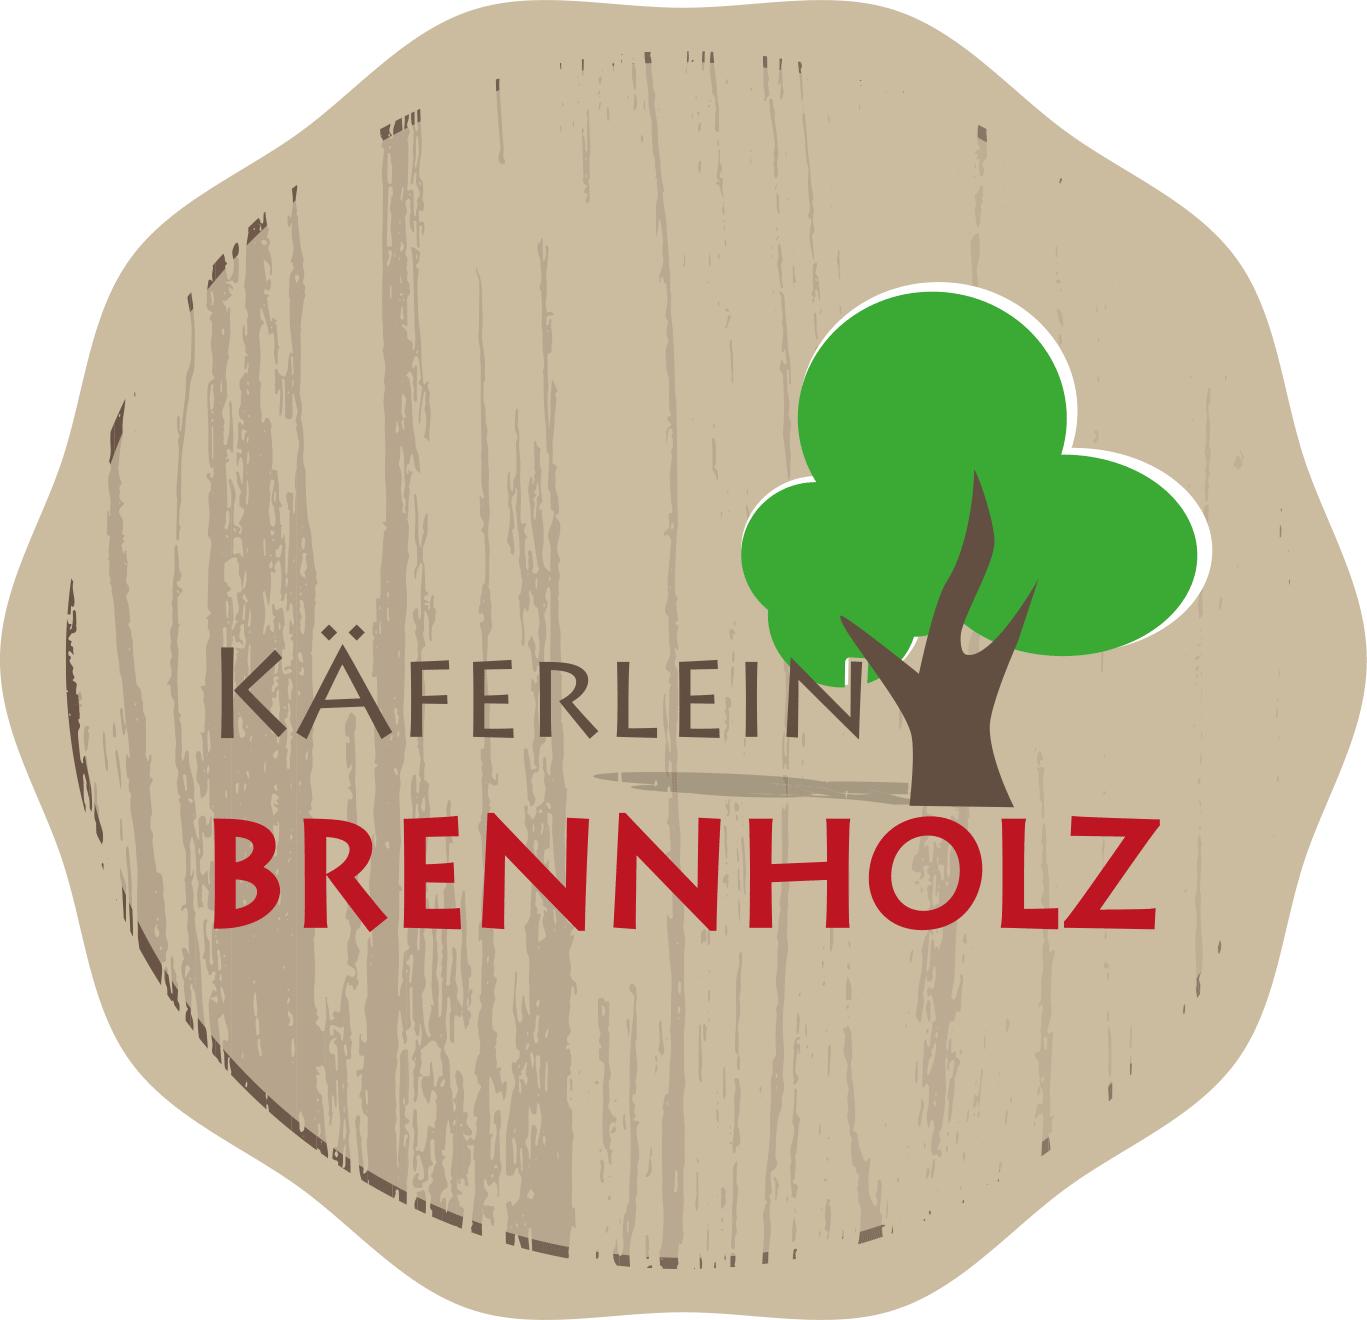 Käferlein Brennholz